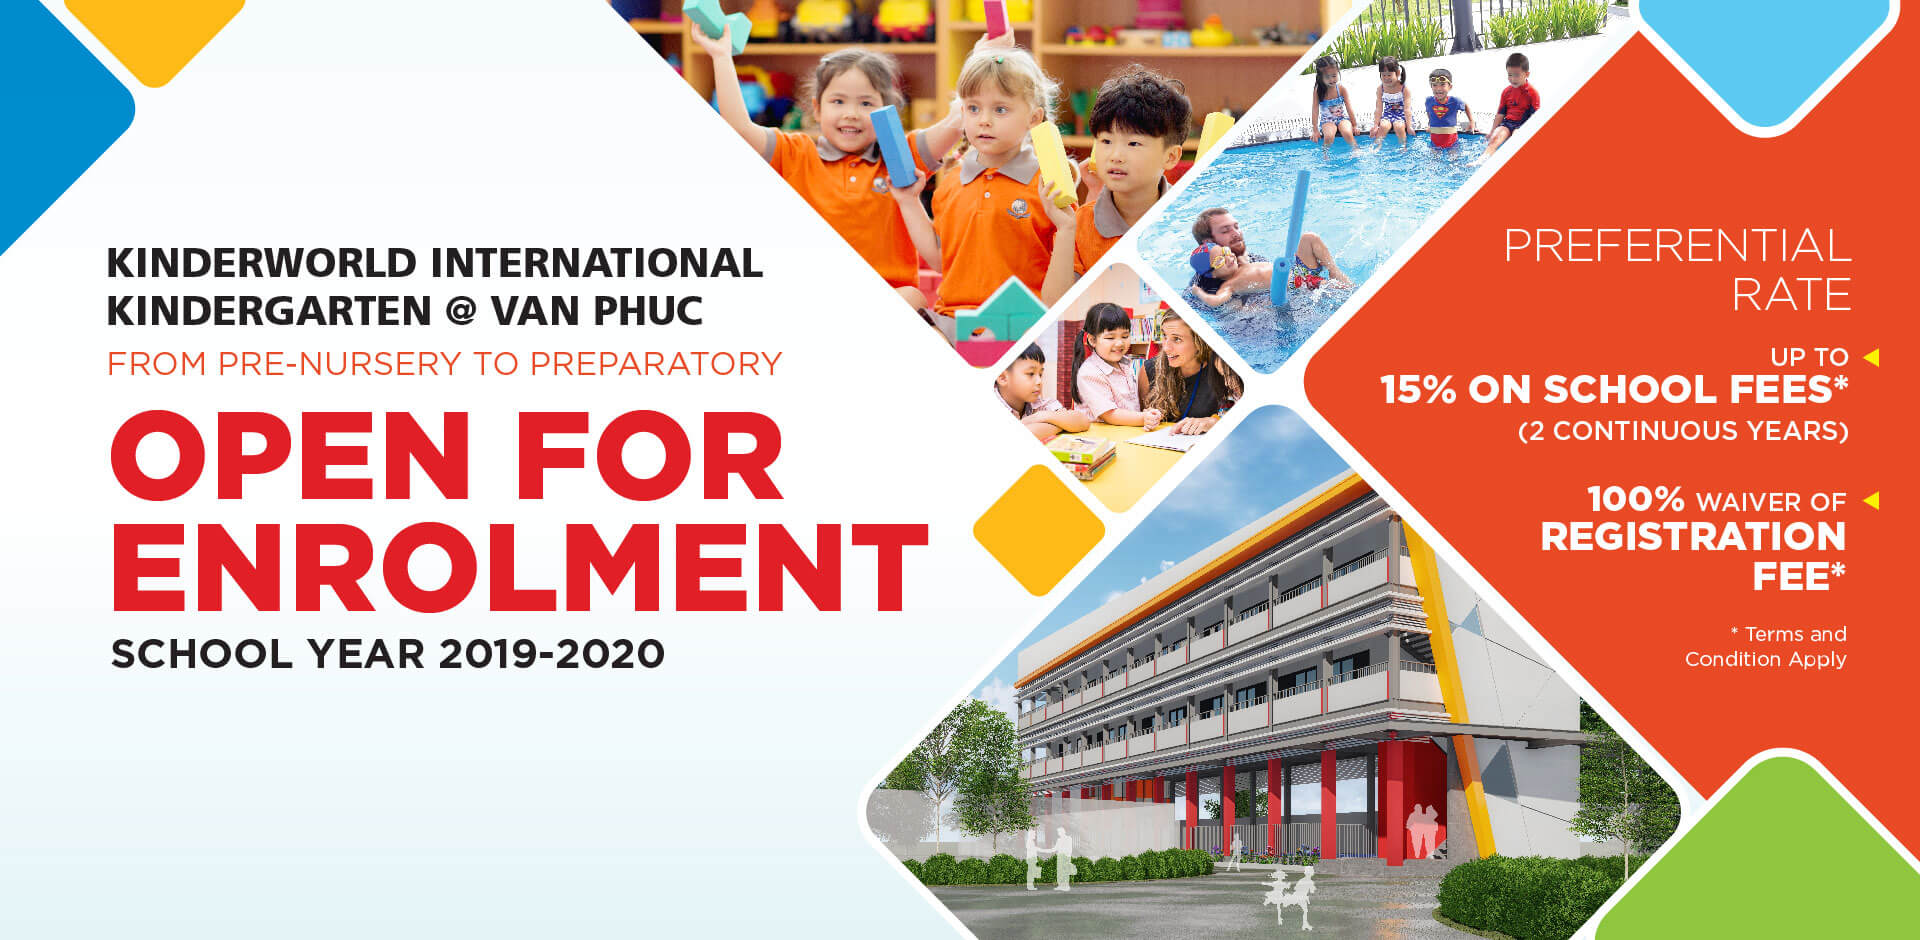 Enrolment KIK Van Phuc